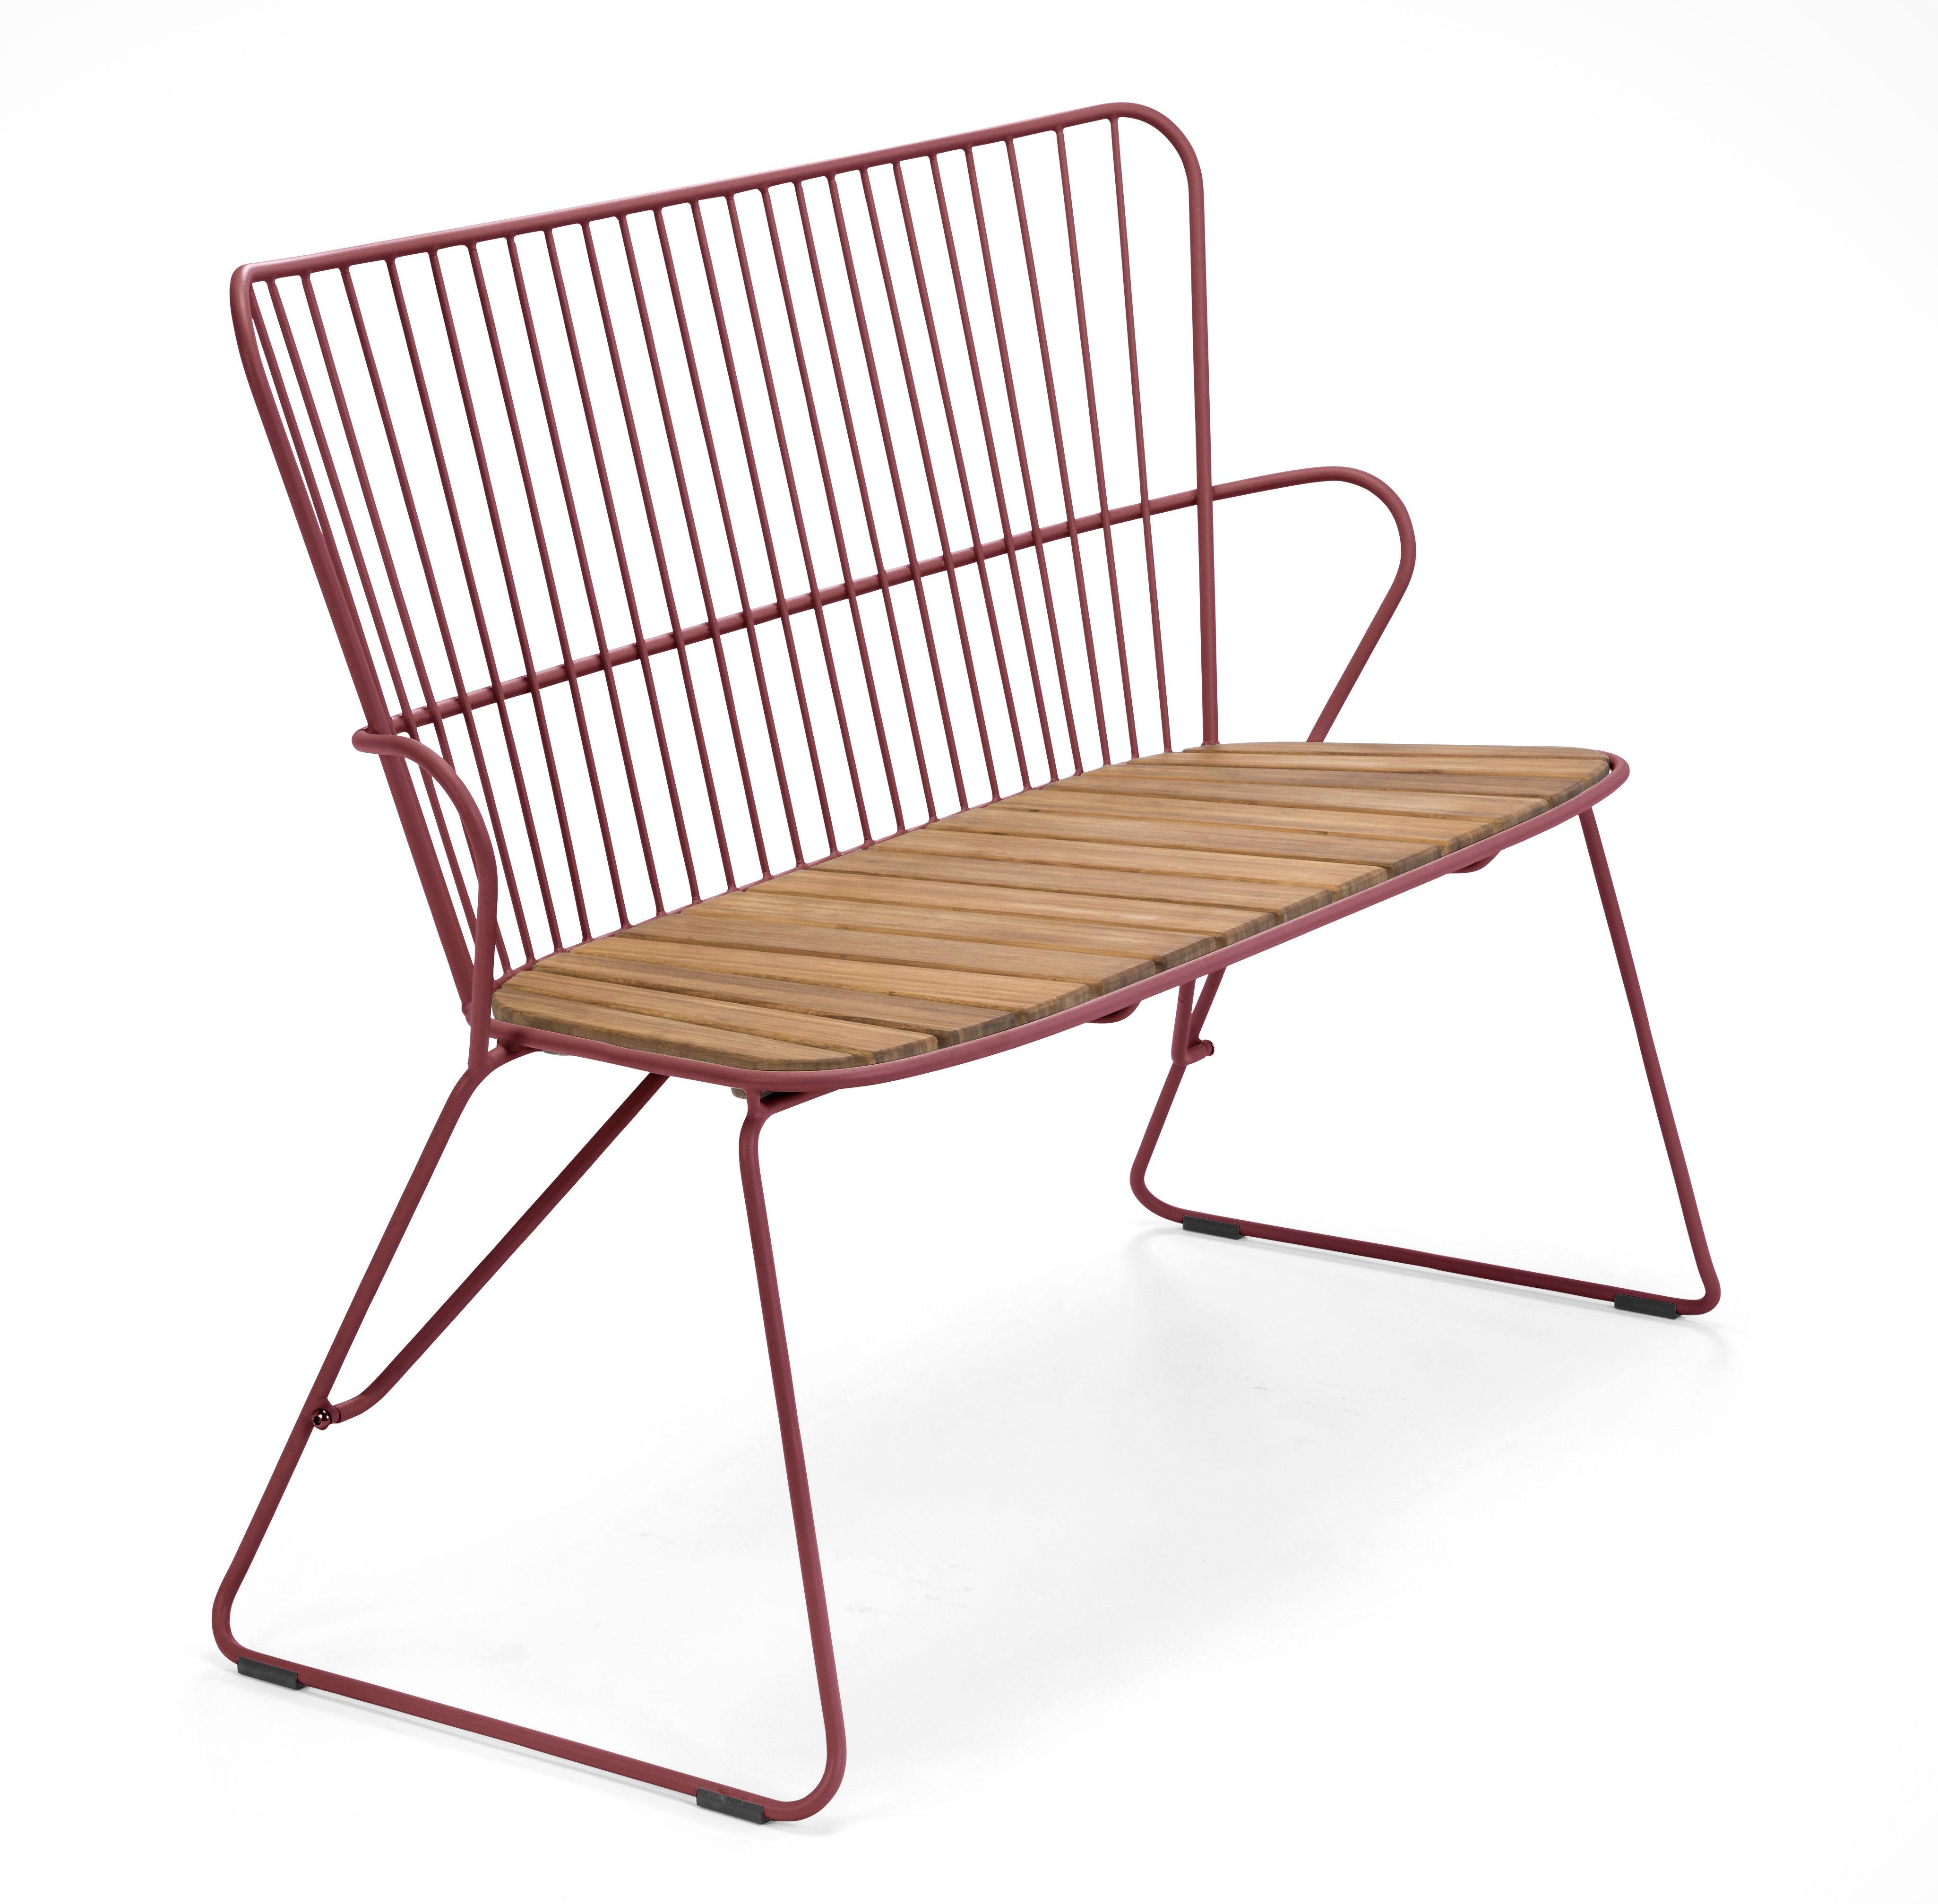 Furniture - Benches - Paon Bench - / L 116 cm - Metal & bamboo by Houe - Bench / Paprika - Acier revêtement poudre, Bamboo